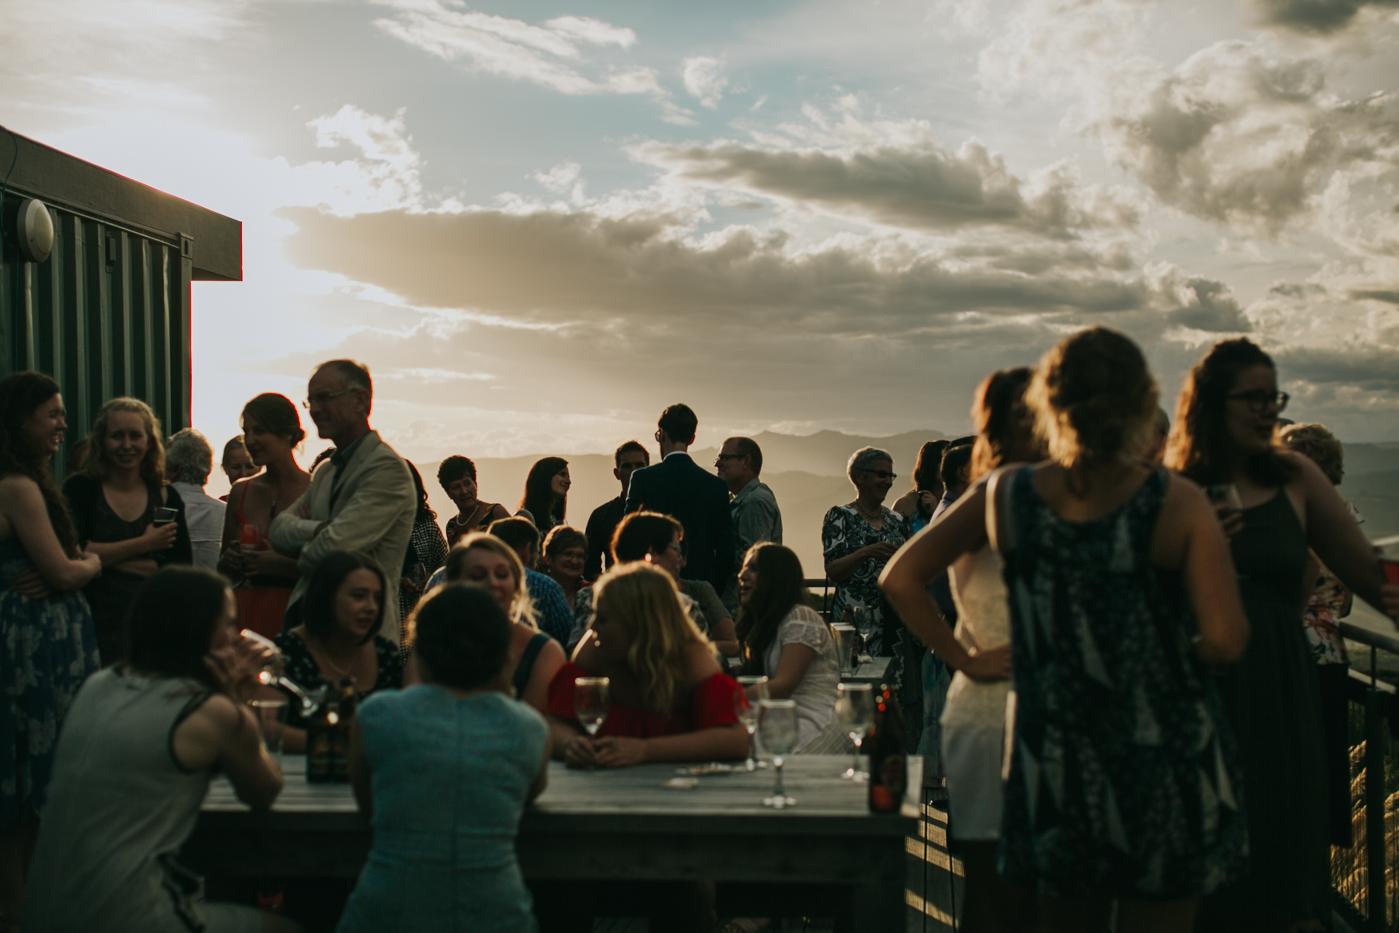 Ariana & Tim - Dunedin, New Zealand Wedding - Destination Wedding - Samantha Heather Photography-227.jpg